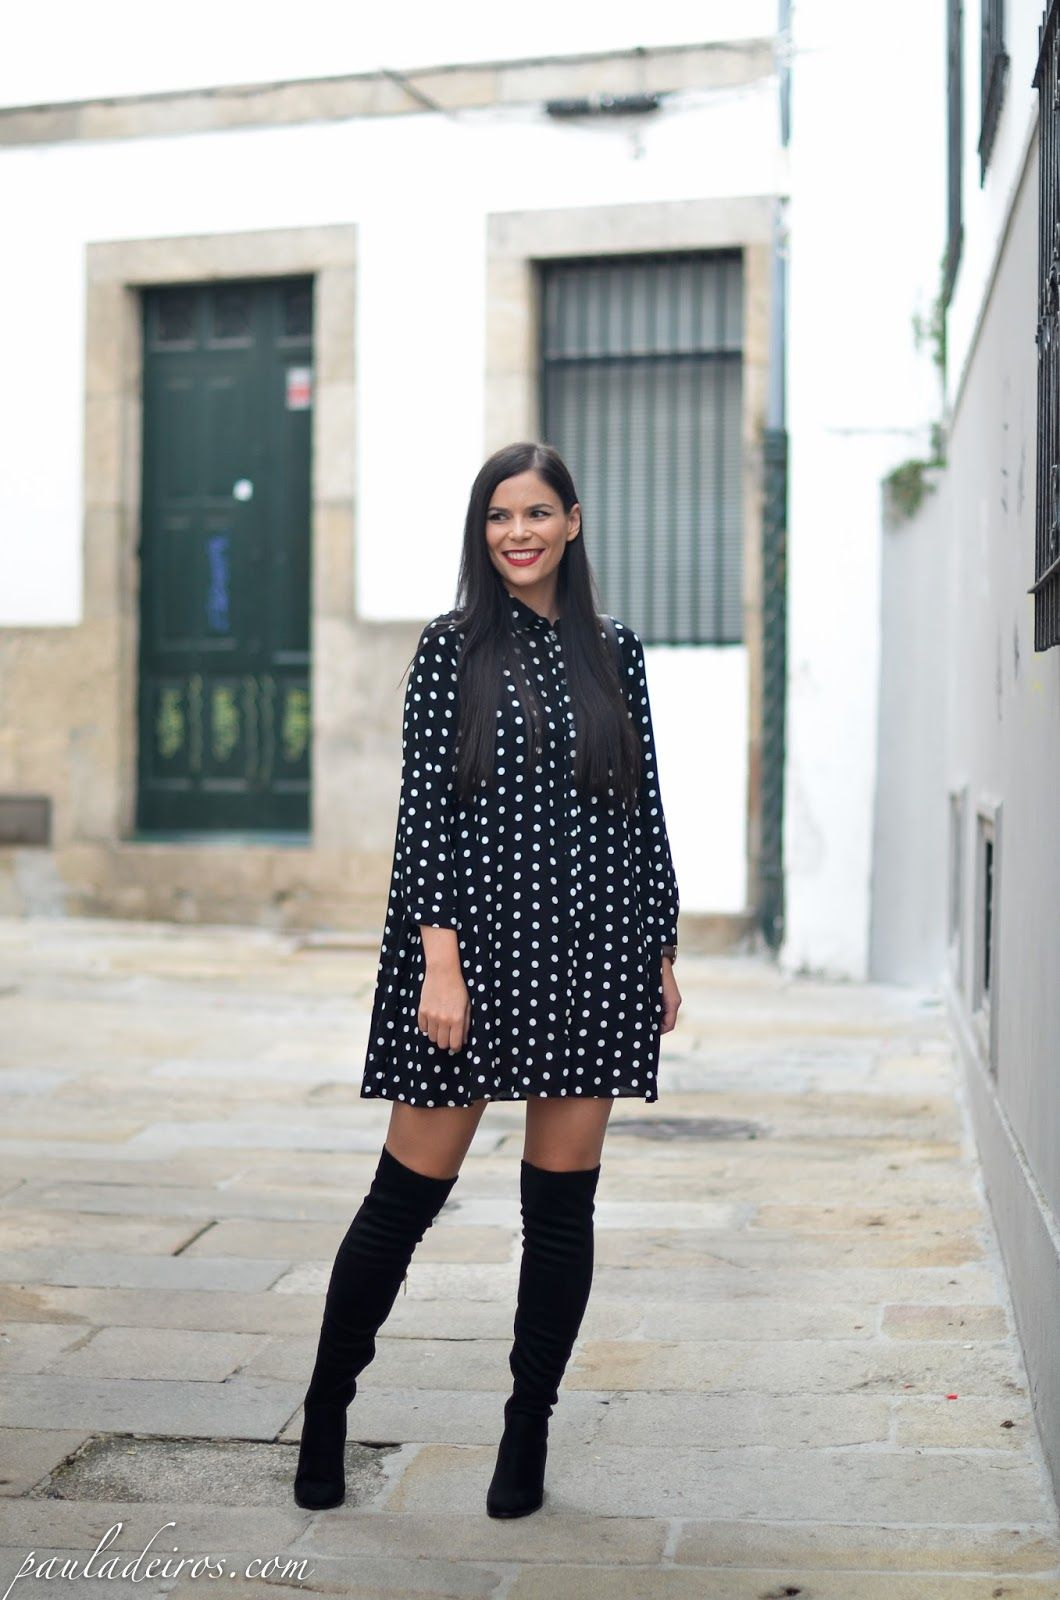 e9fbd7ec42ce PAULA DEIROS SECRETS  Polka dot Dress   Over Knee Boots